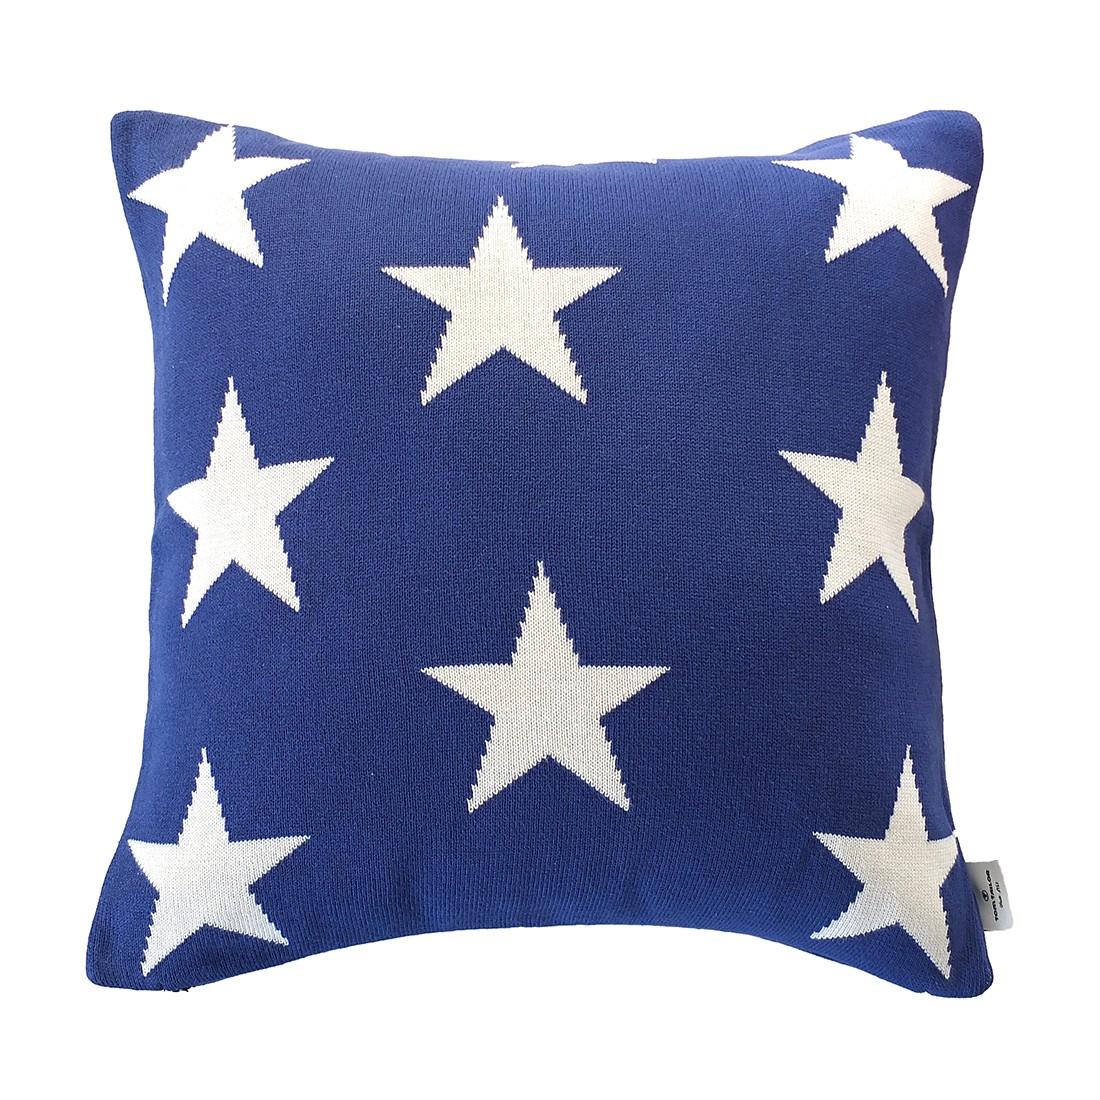 Kissenhülle T-Big Star – Blau – Maße: 50 x 50 cm, Tom Tailor günstig